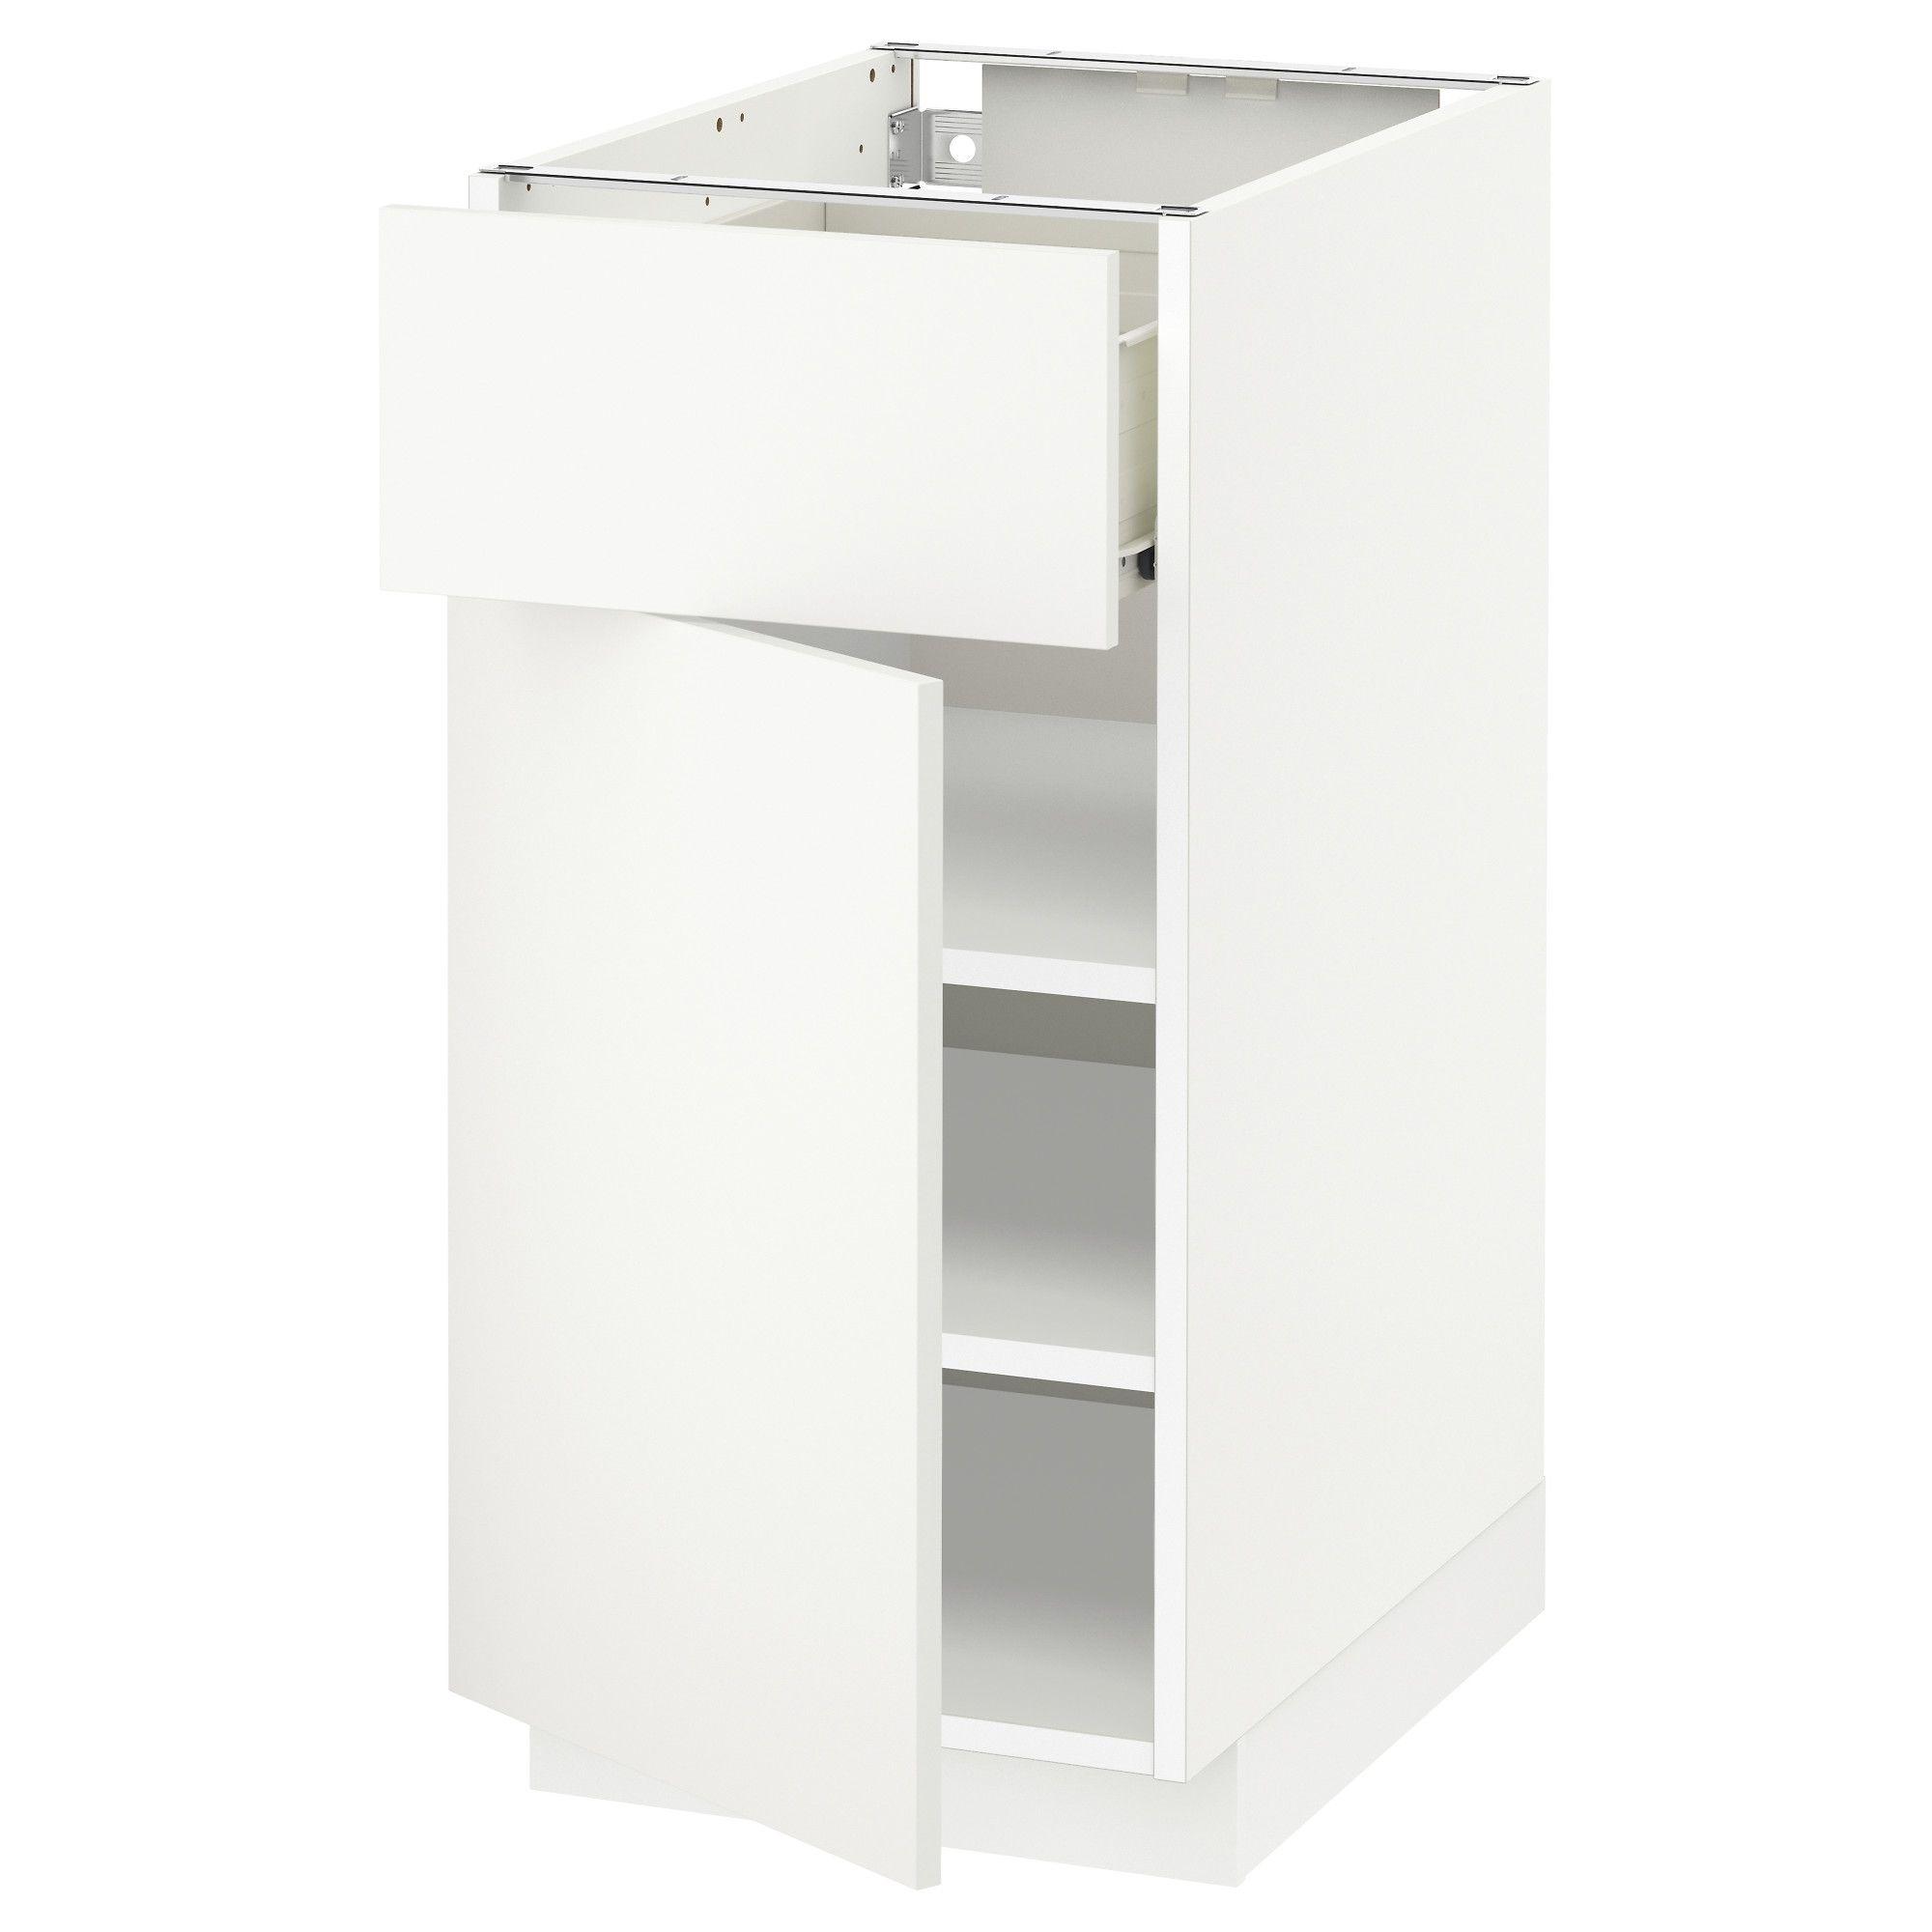 Metod Modular Kitchens Ikea Base Cabinets Ikea Cabinet Drawers